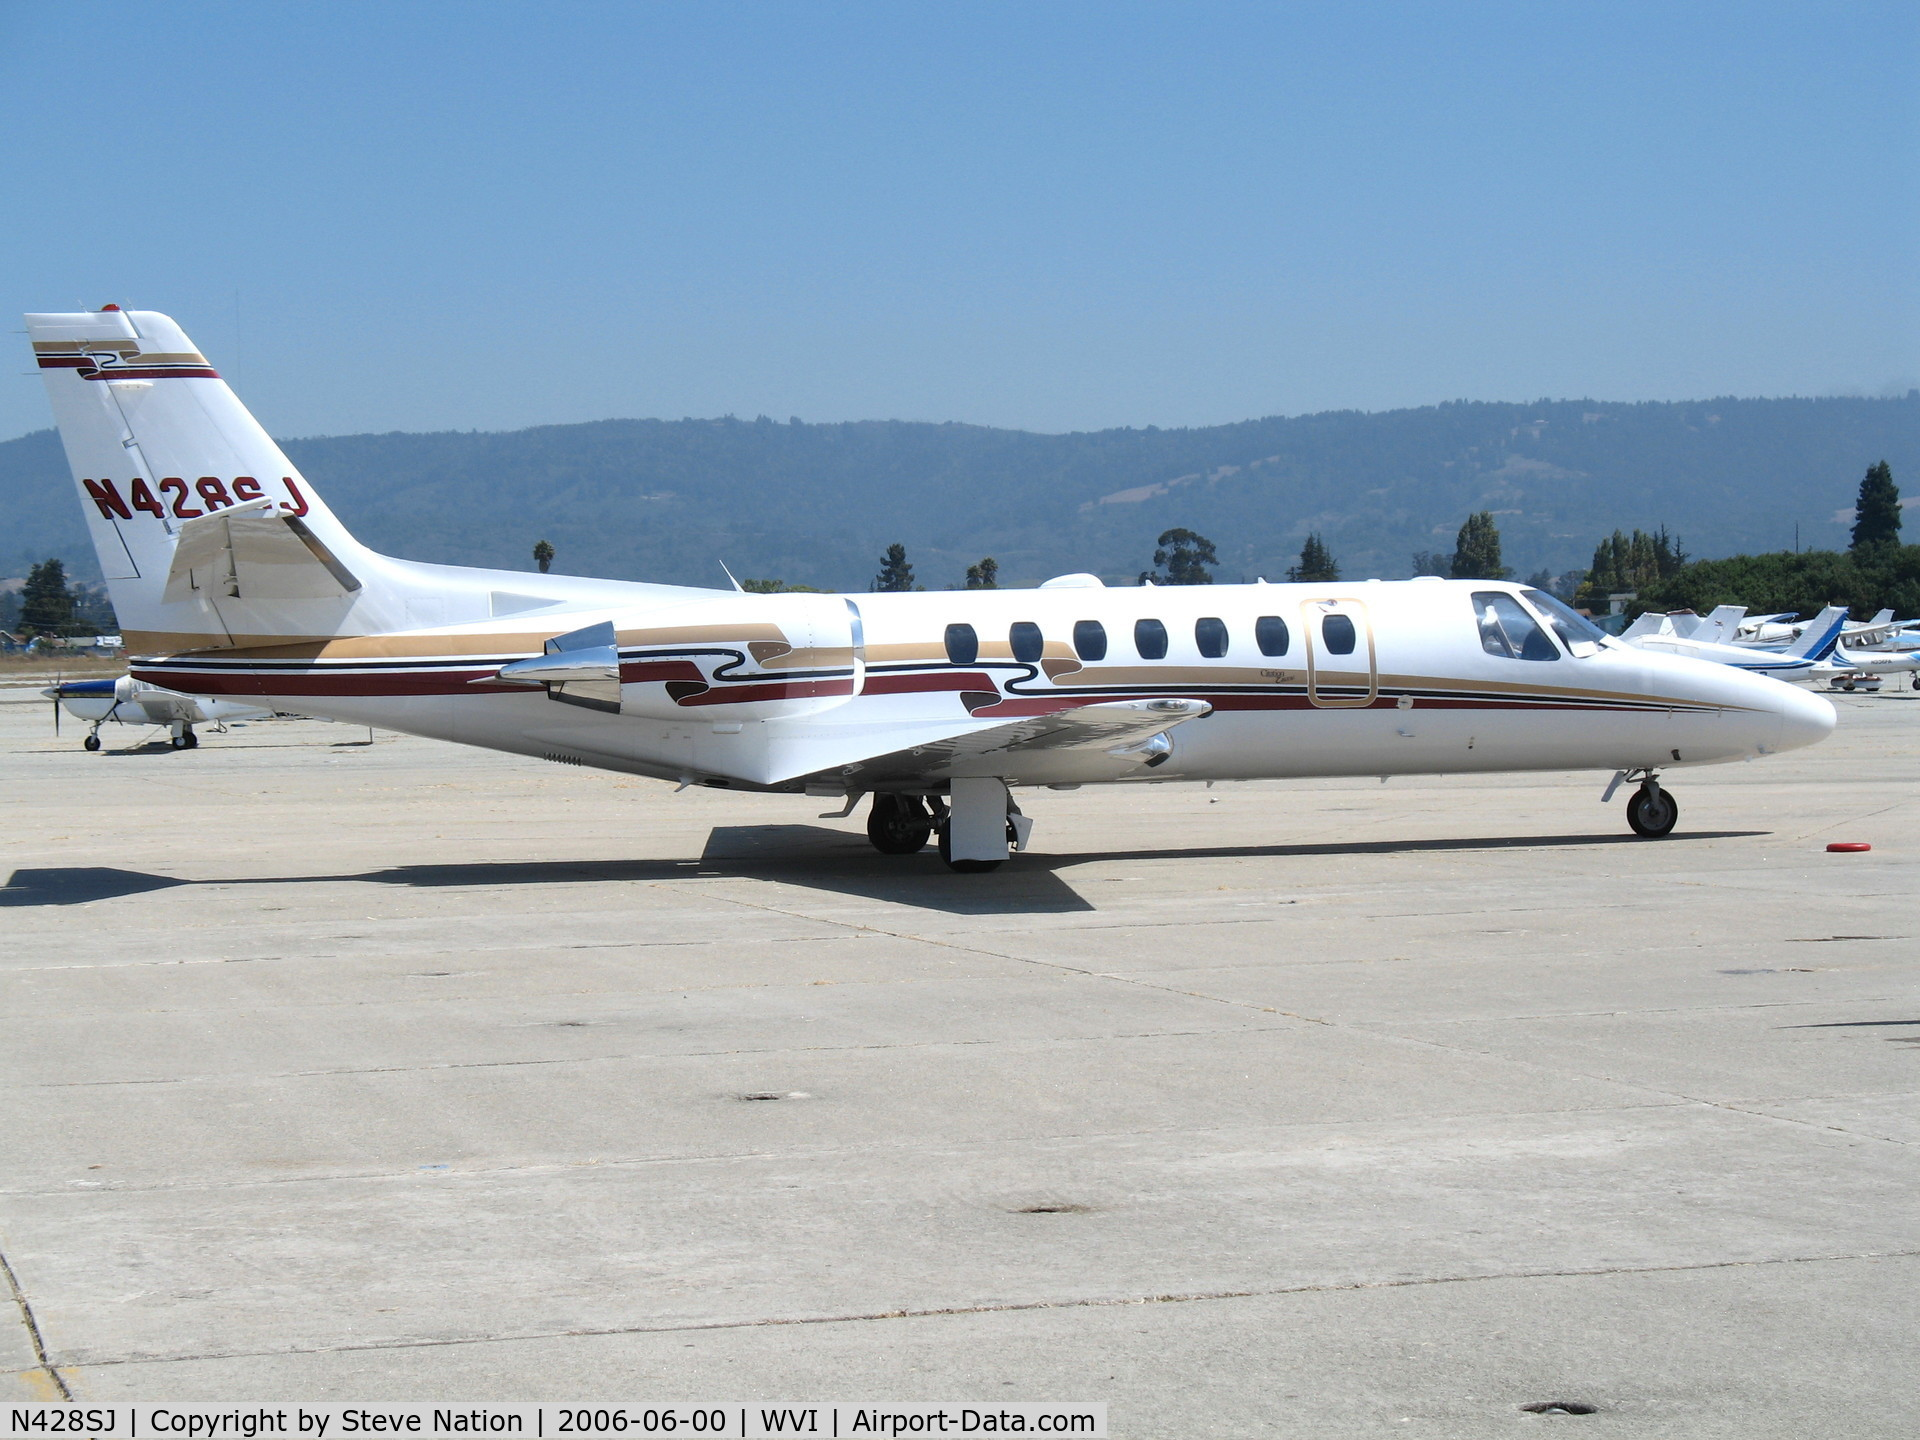 N428SJ, 2001 Cessna 560 C/N 560-0584, Airlie Air 2001 Cessna 560 @ Watsonville Municipal Airport, CA